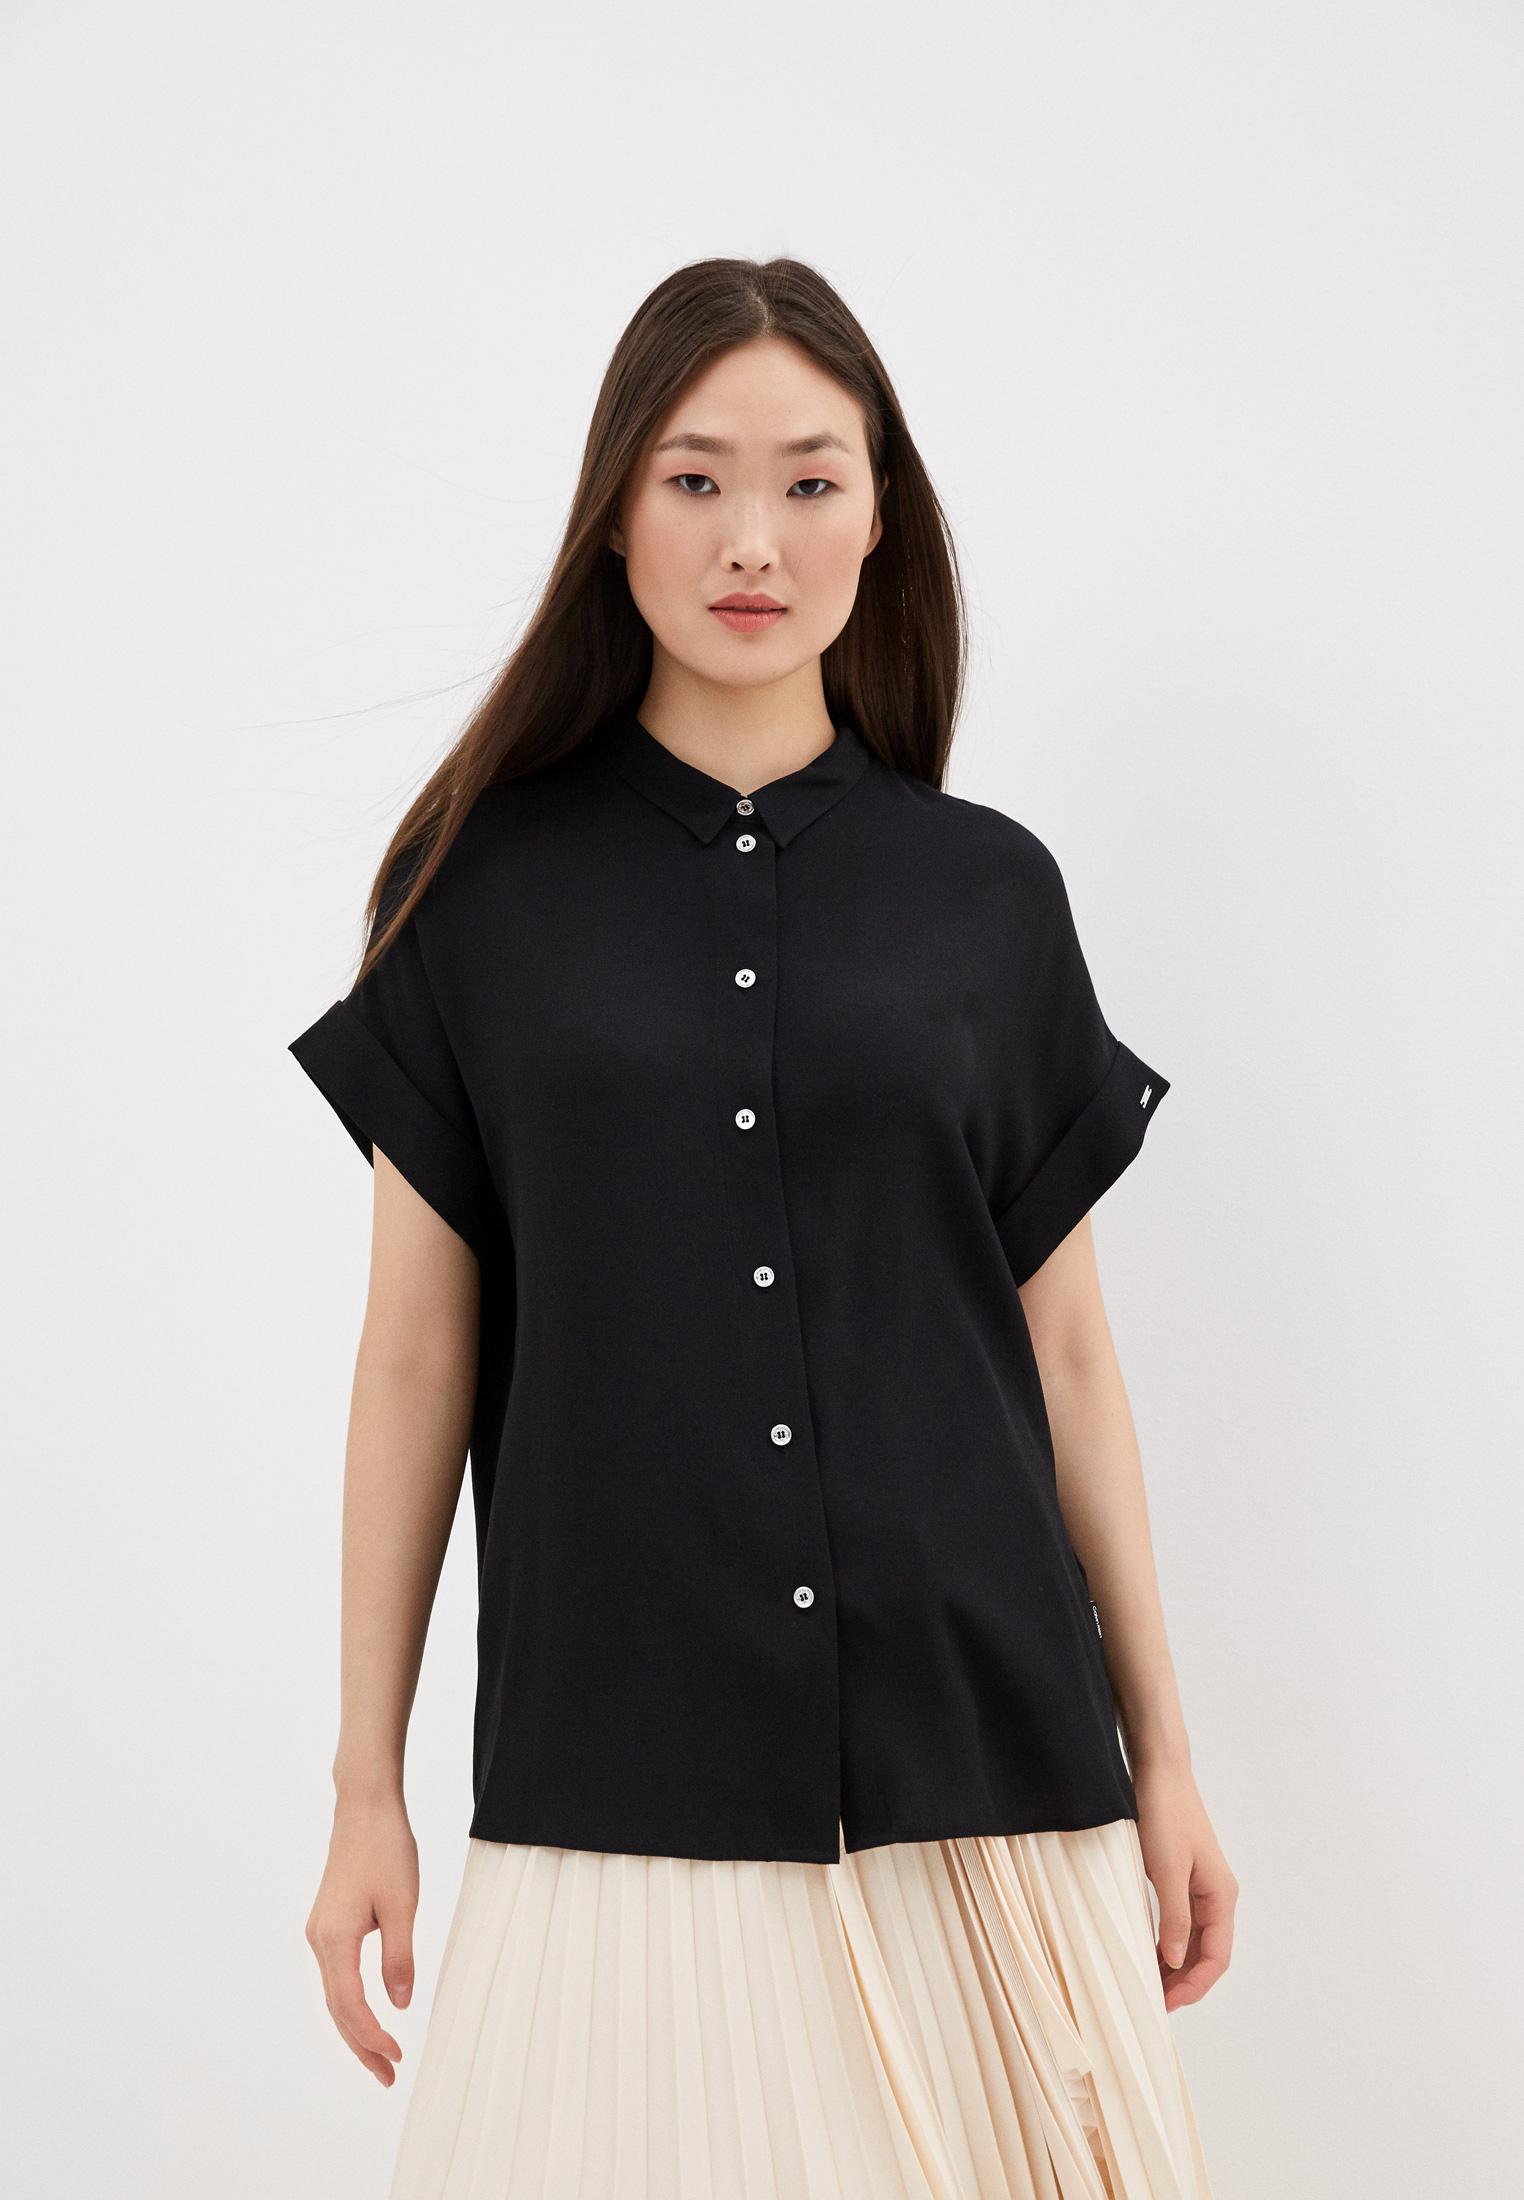 Блуза Calvin Klein (Кельвин Кляйн) K20k201950